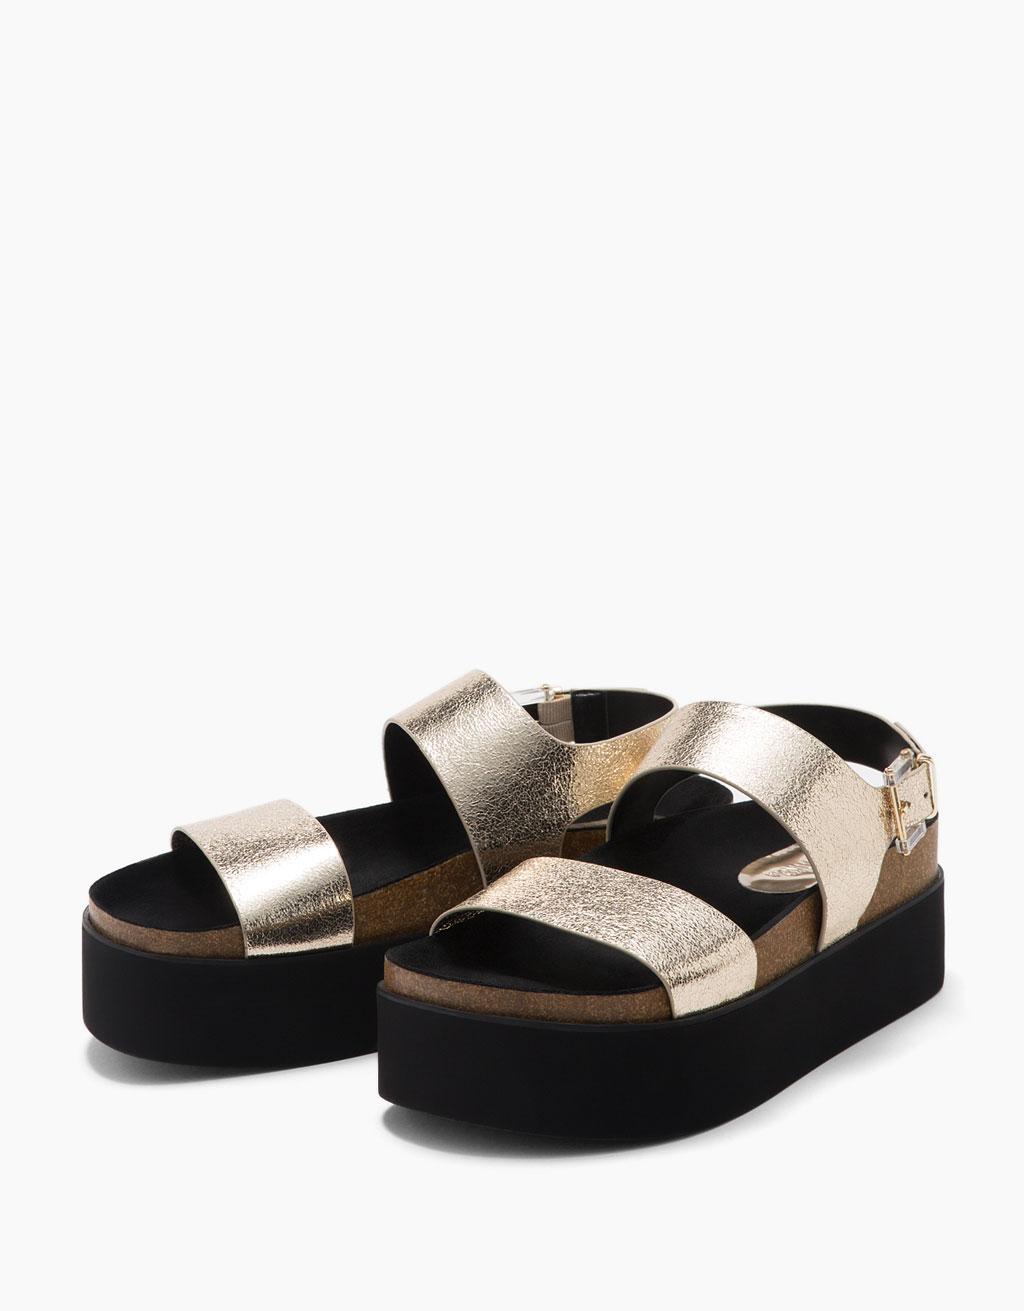 Metallic bio platform sandals